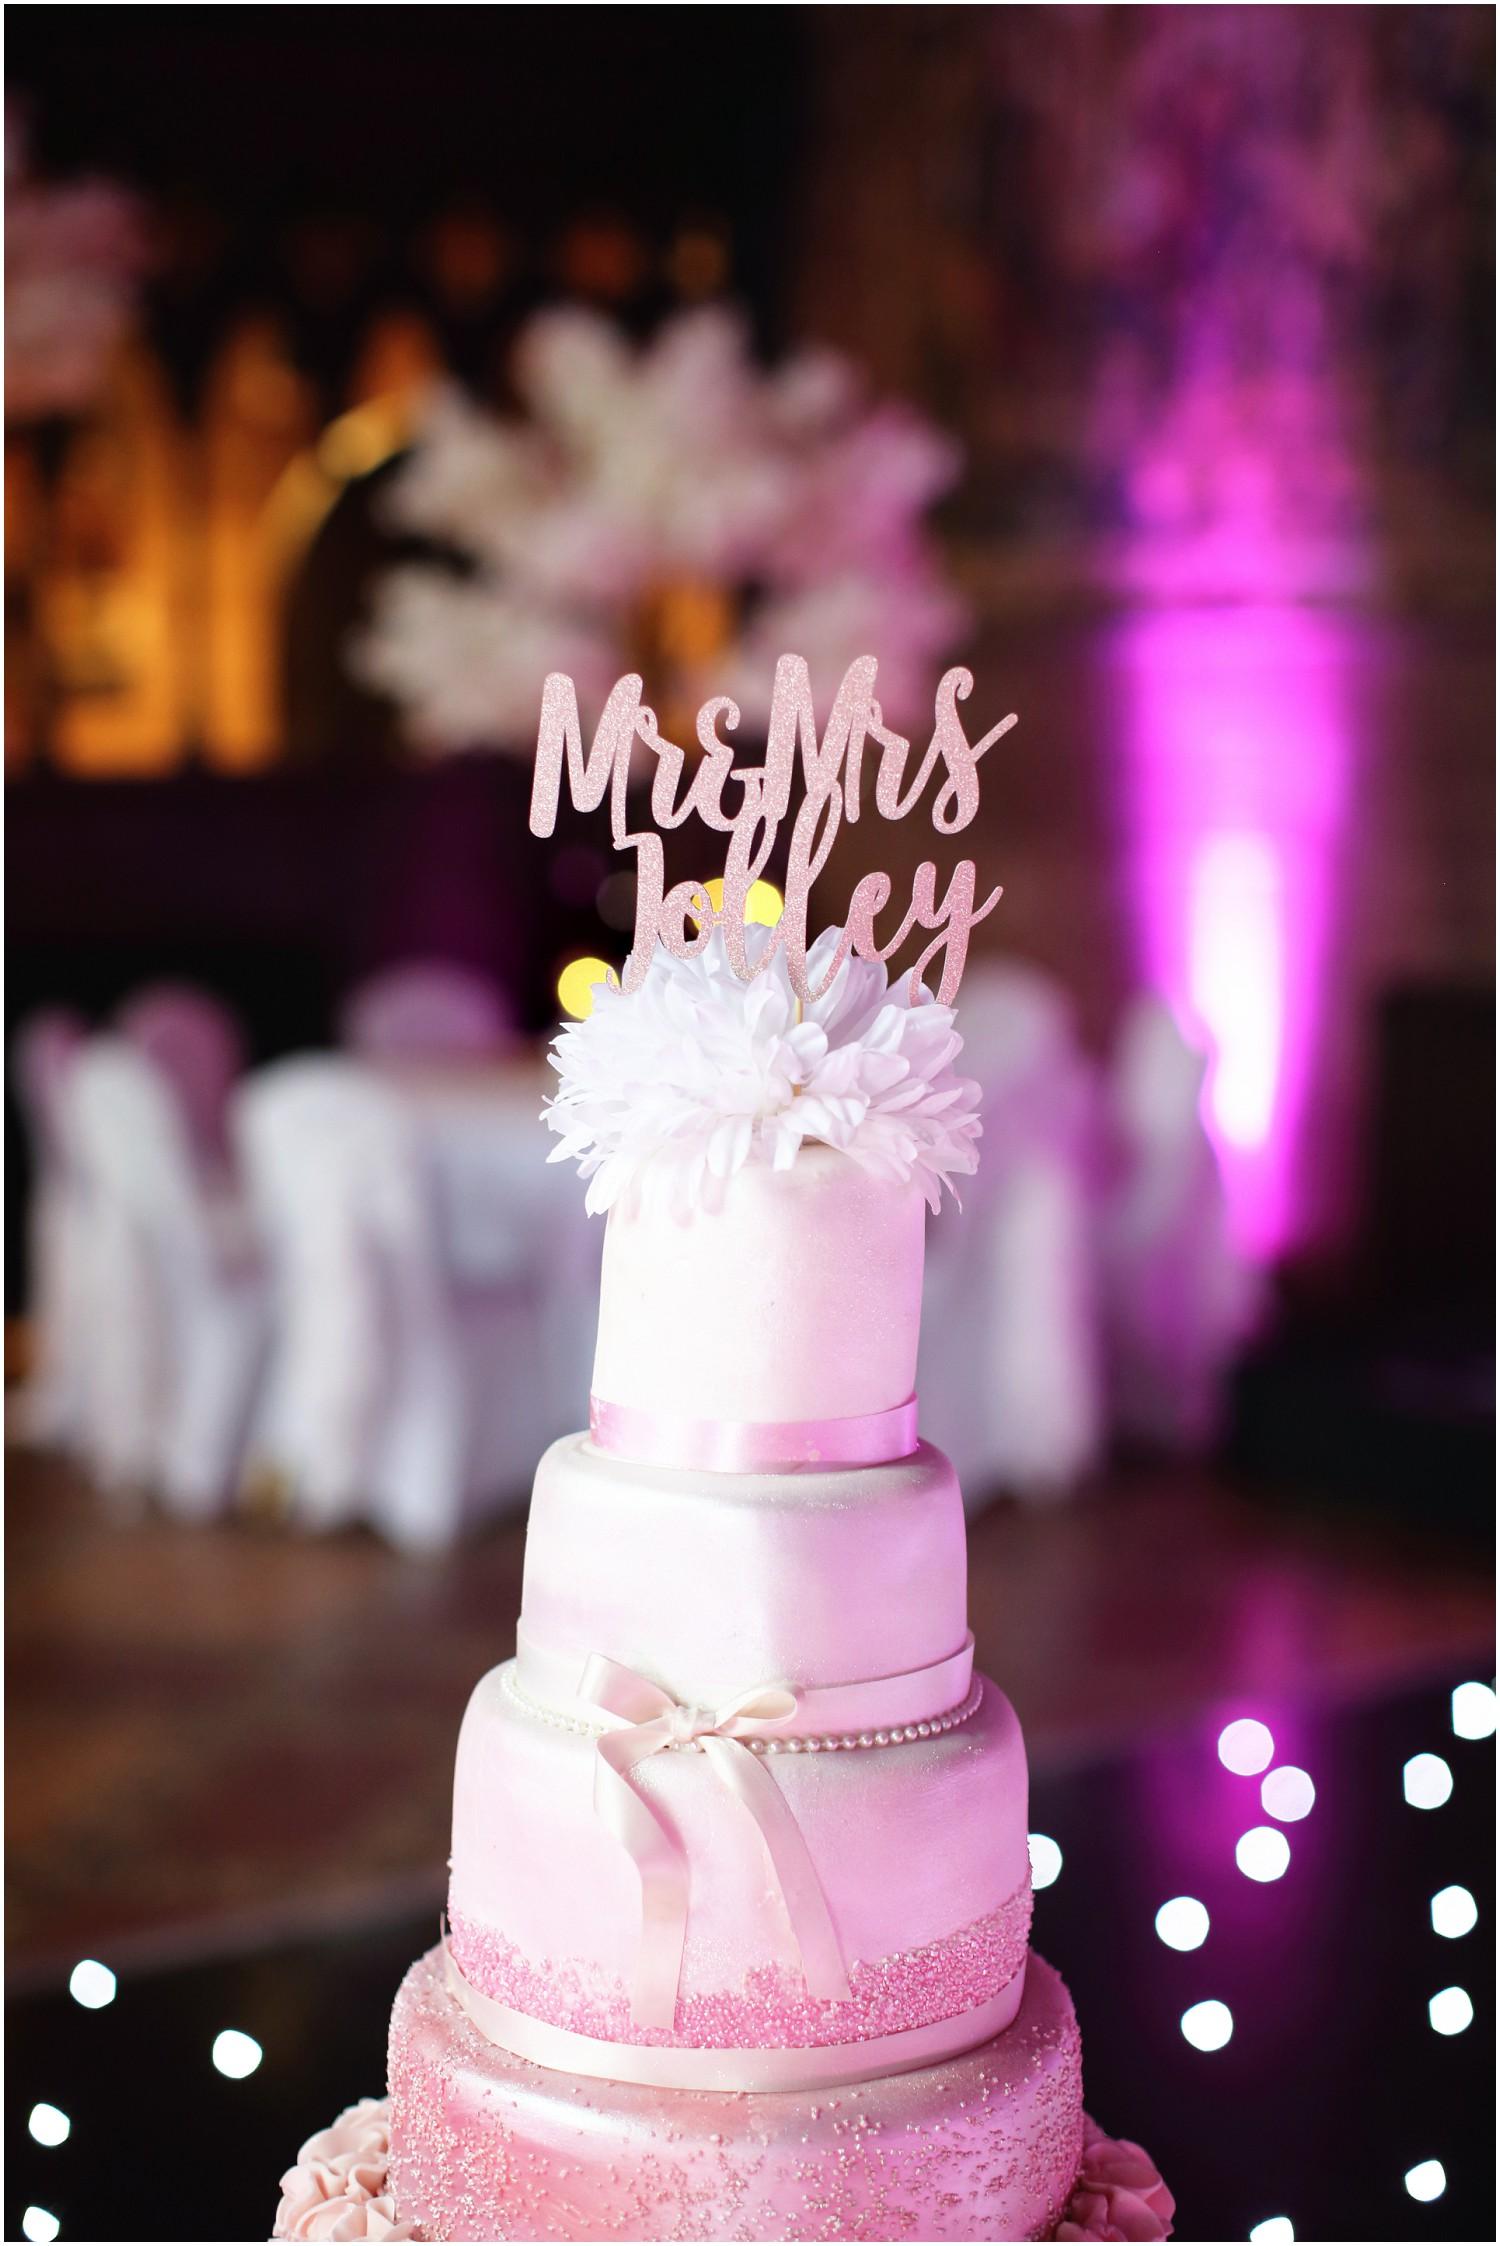 wedding cake with names